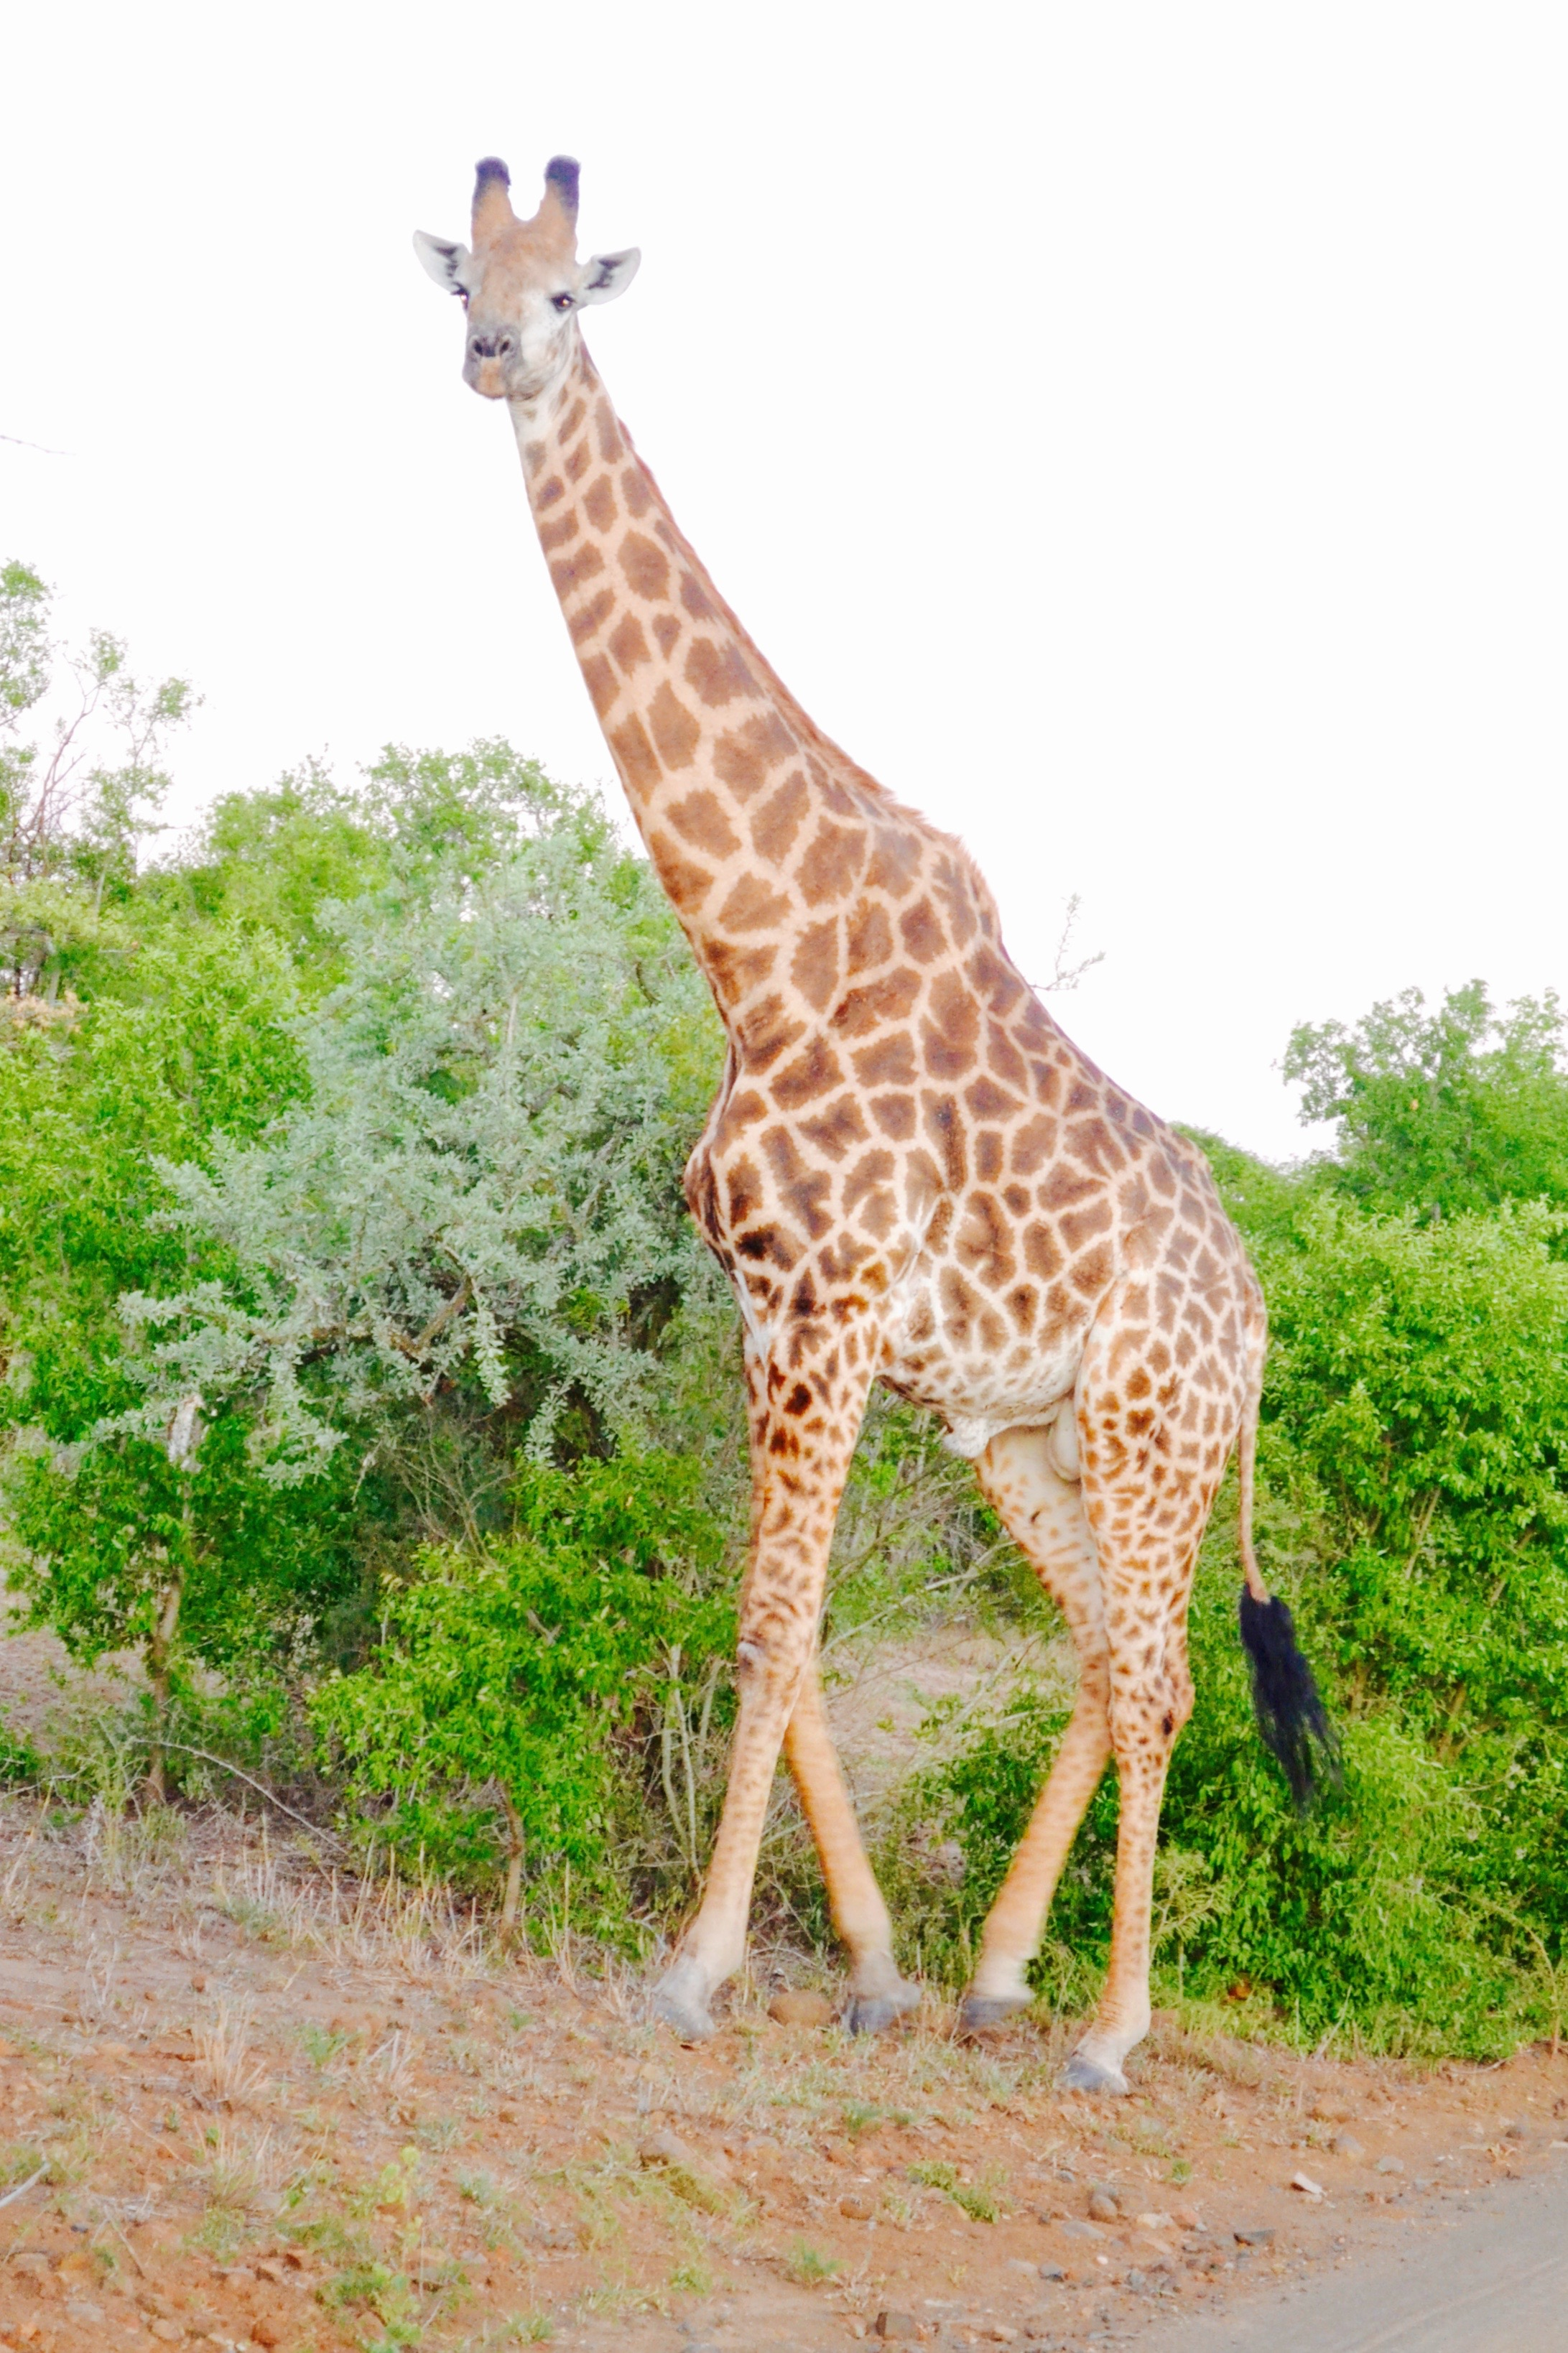 south-africa Girafe.Ma couleur a ses merveilles. Voyage en terre zouloue